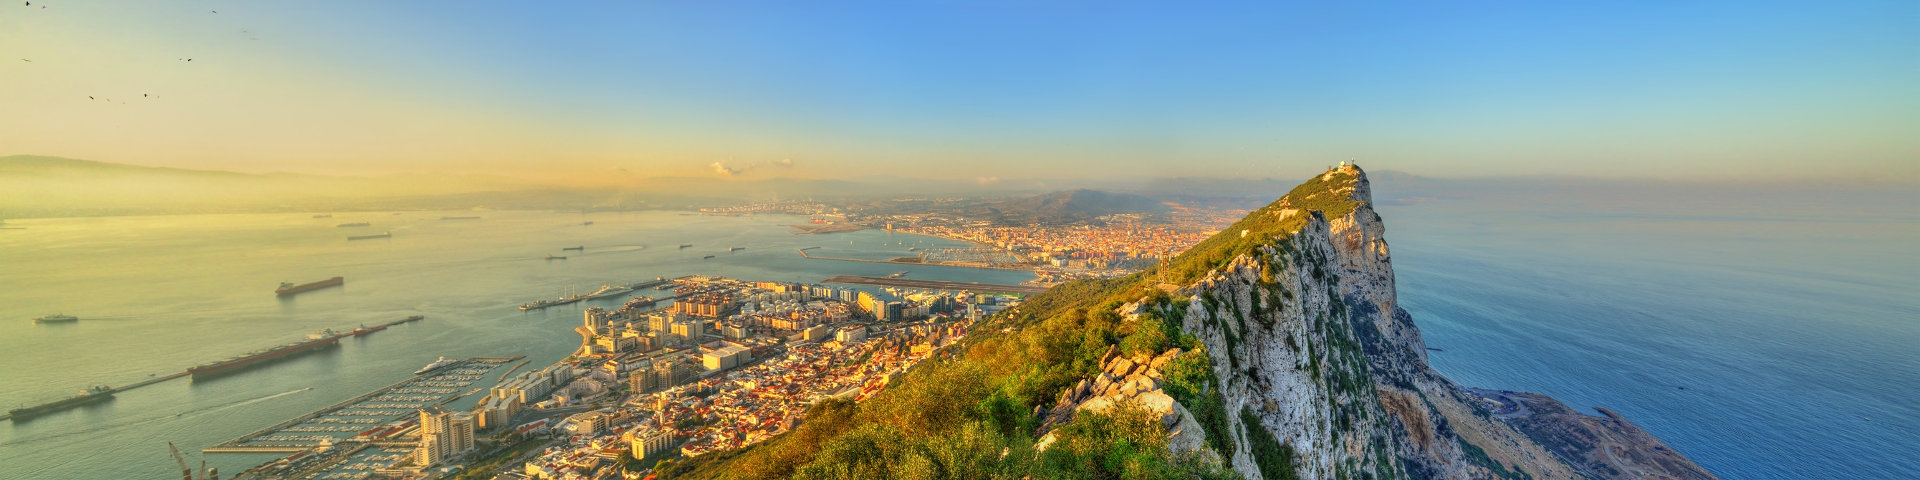 Hero gibraltar city skyline edited